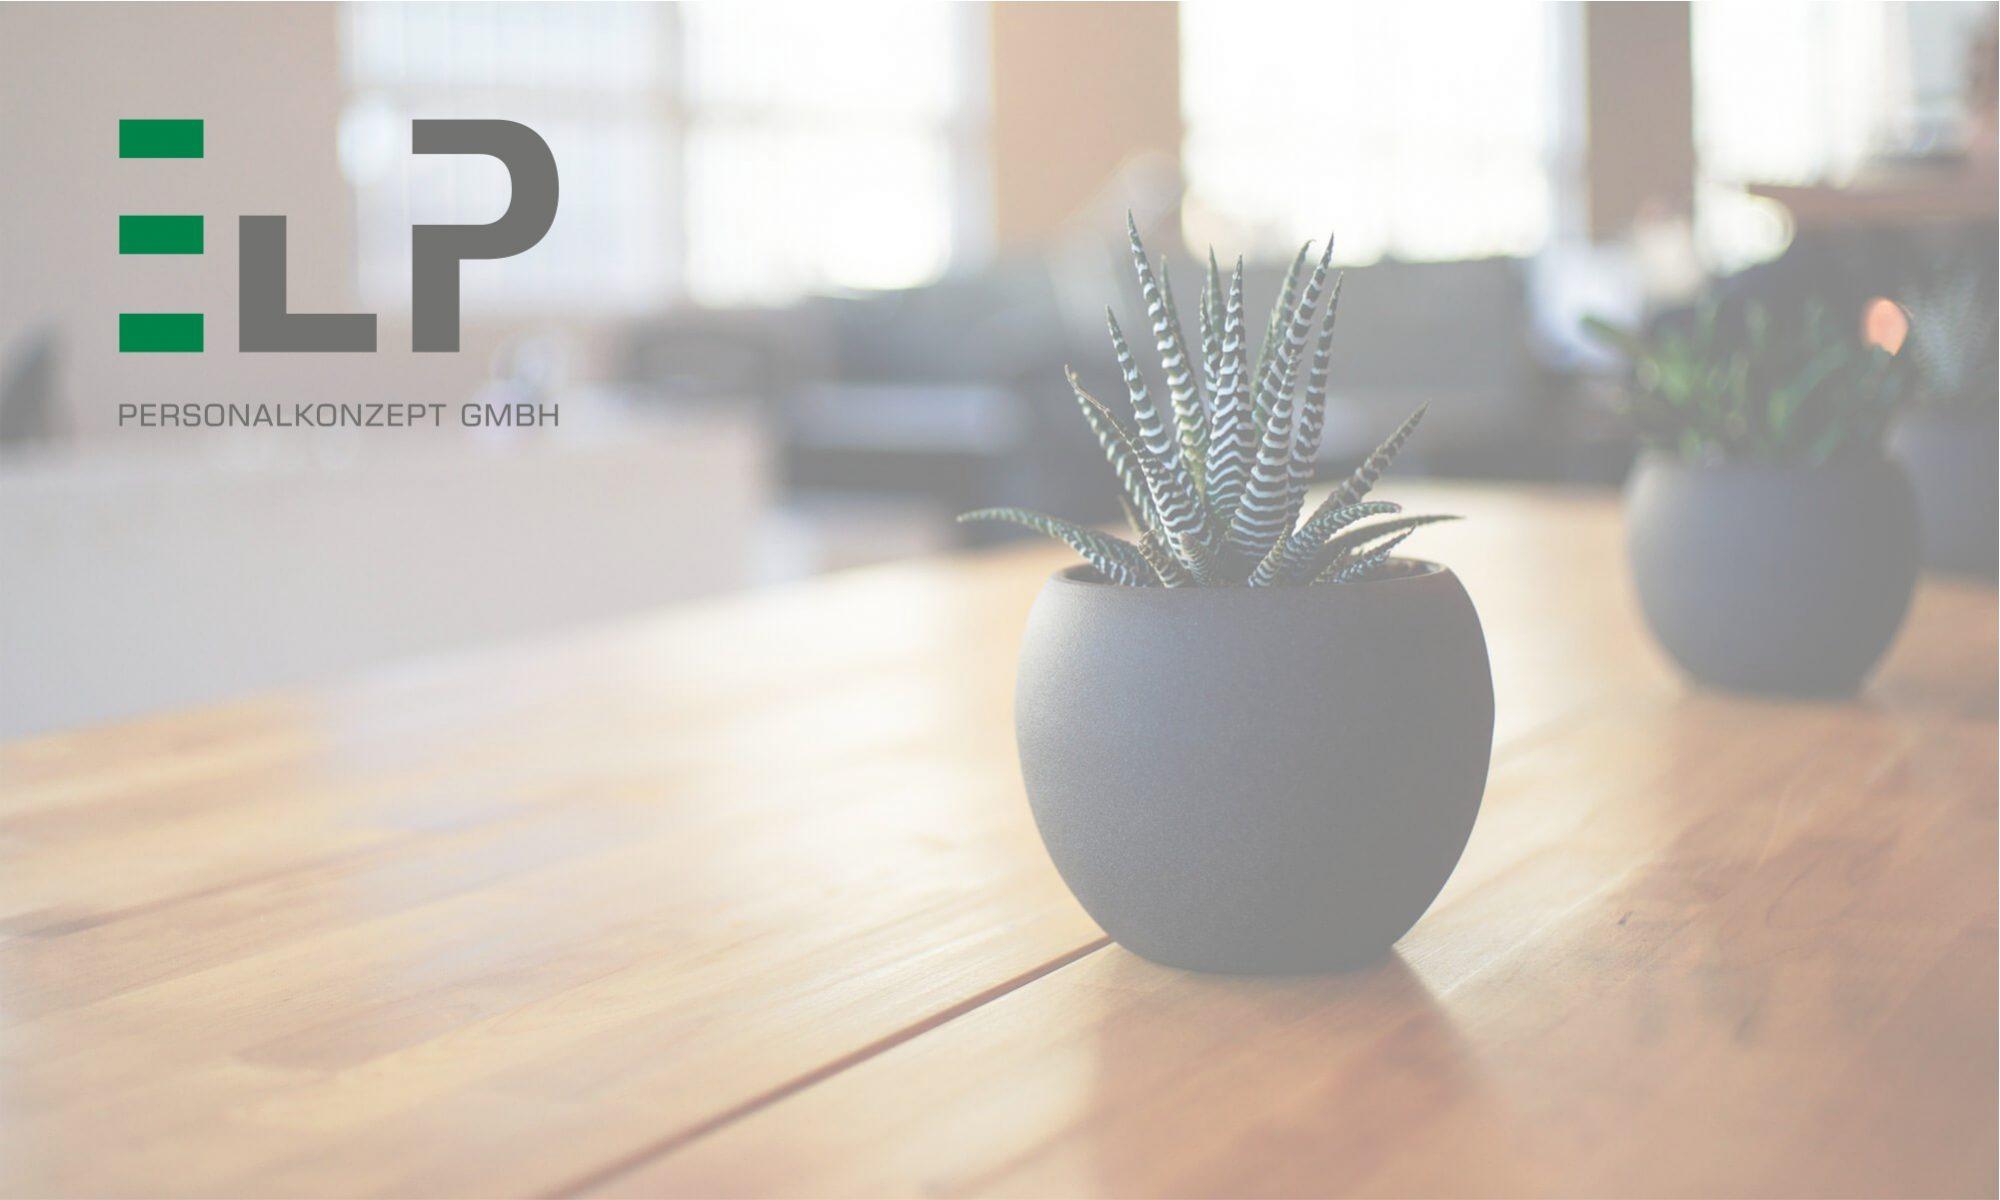 ELP Personalkonzept GmbH